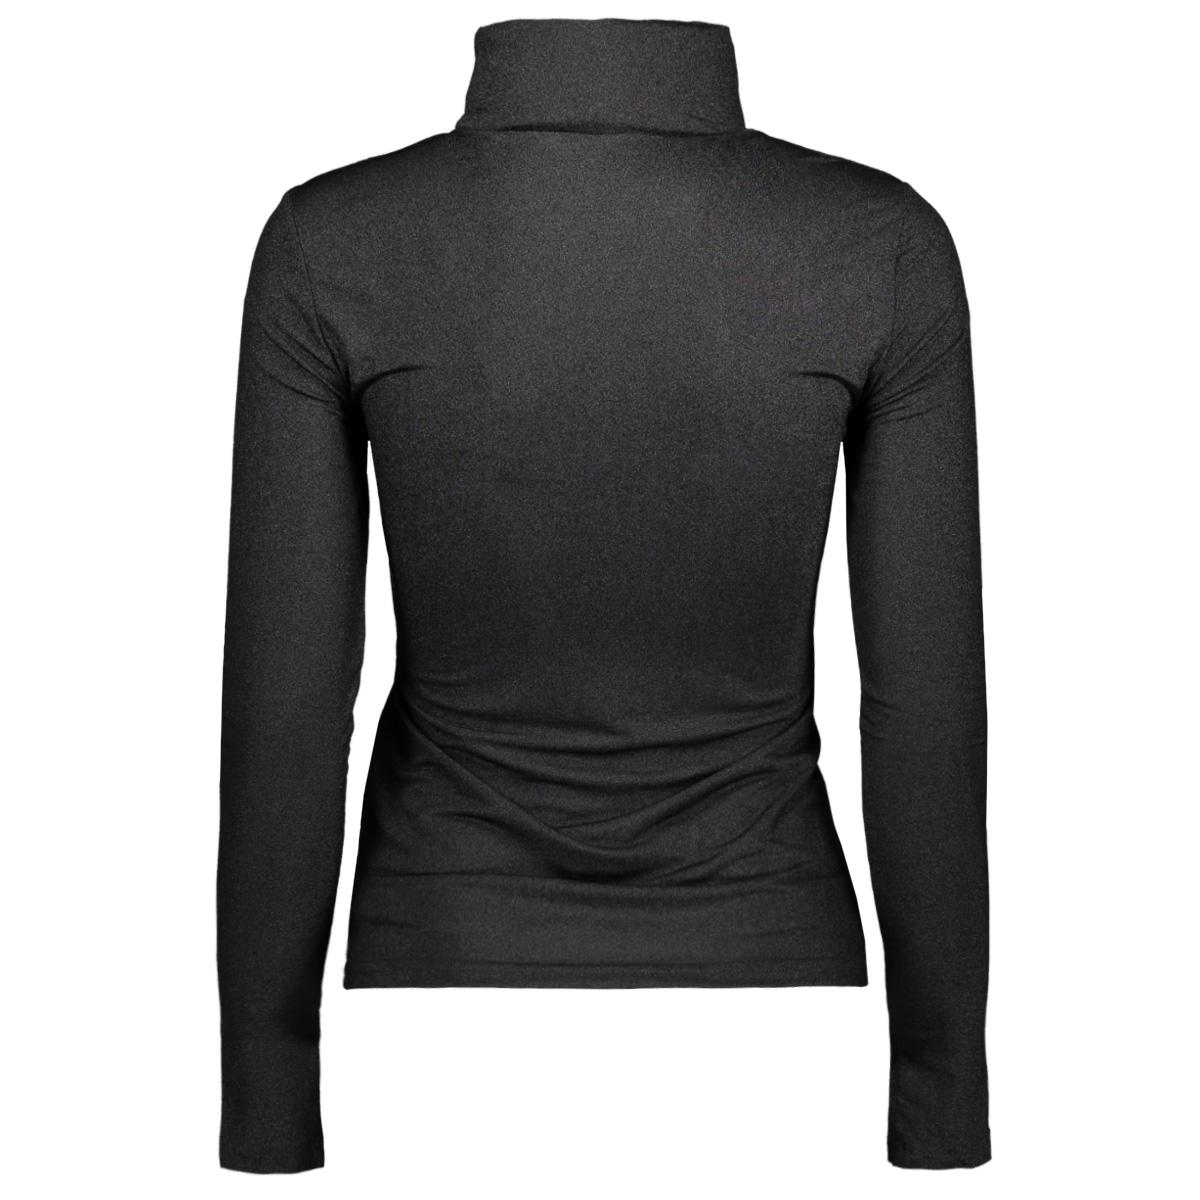 nmnadja l/s top 27009717 noisy may t-shirt black